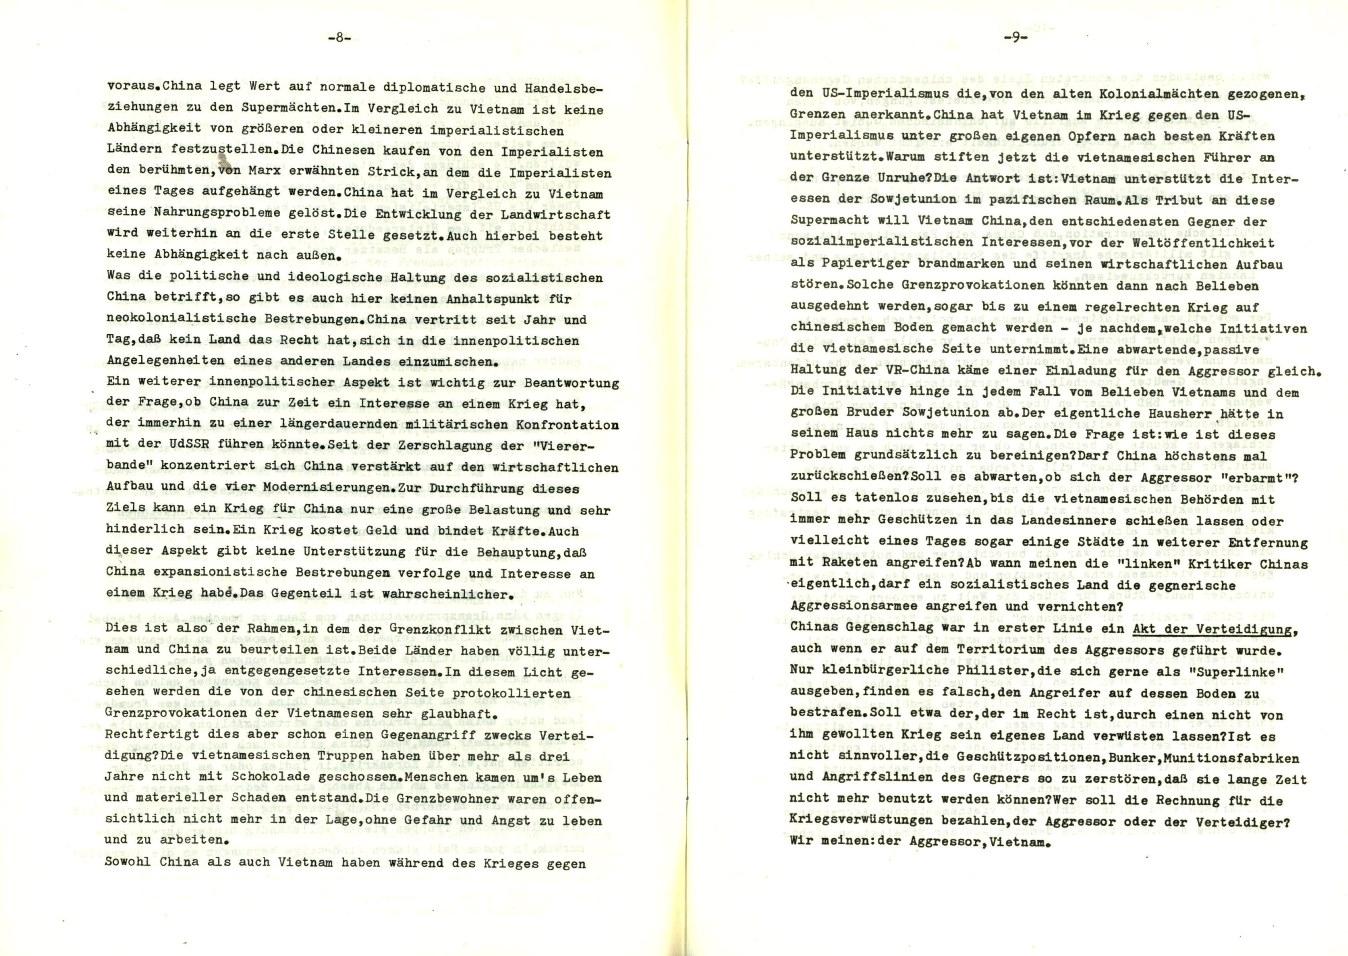 Muenchen_Kampf_dem_Revisionismus_1979_10_05